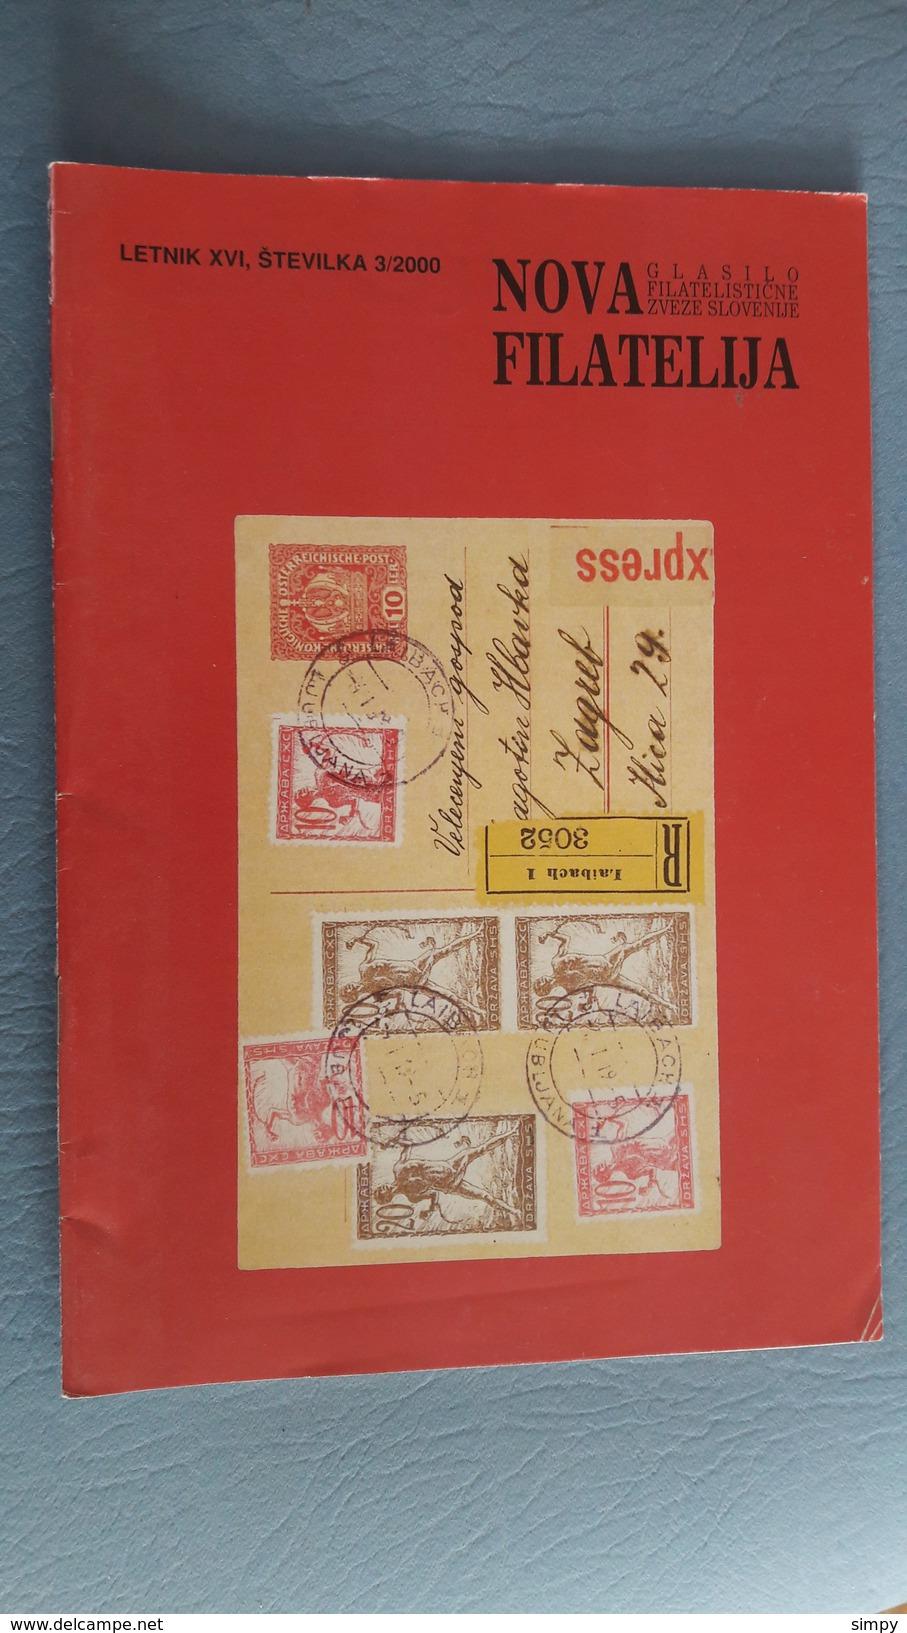 Slovenia - Philatelic Bulletin Nova Filatelija 3/2000 - Ohne Zuordnung